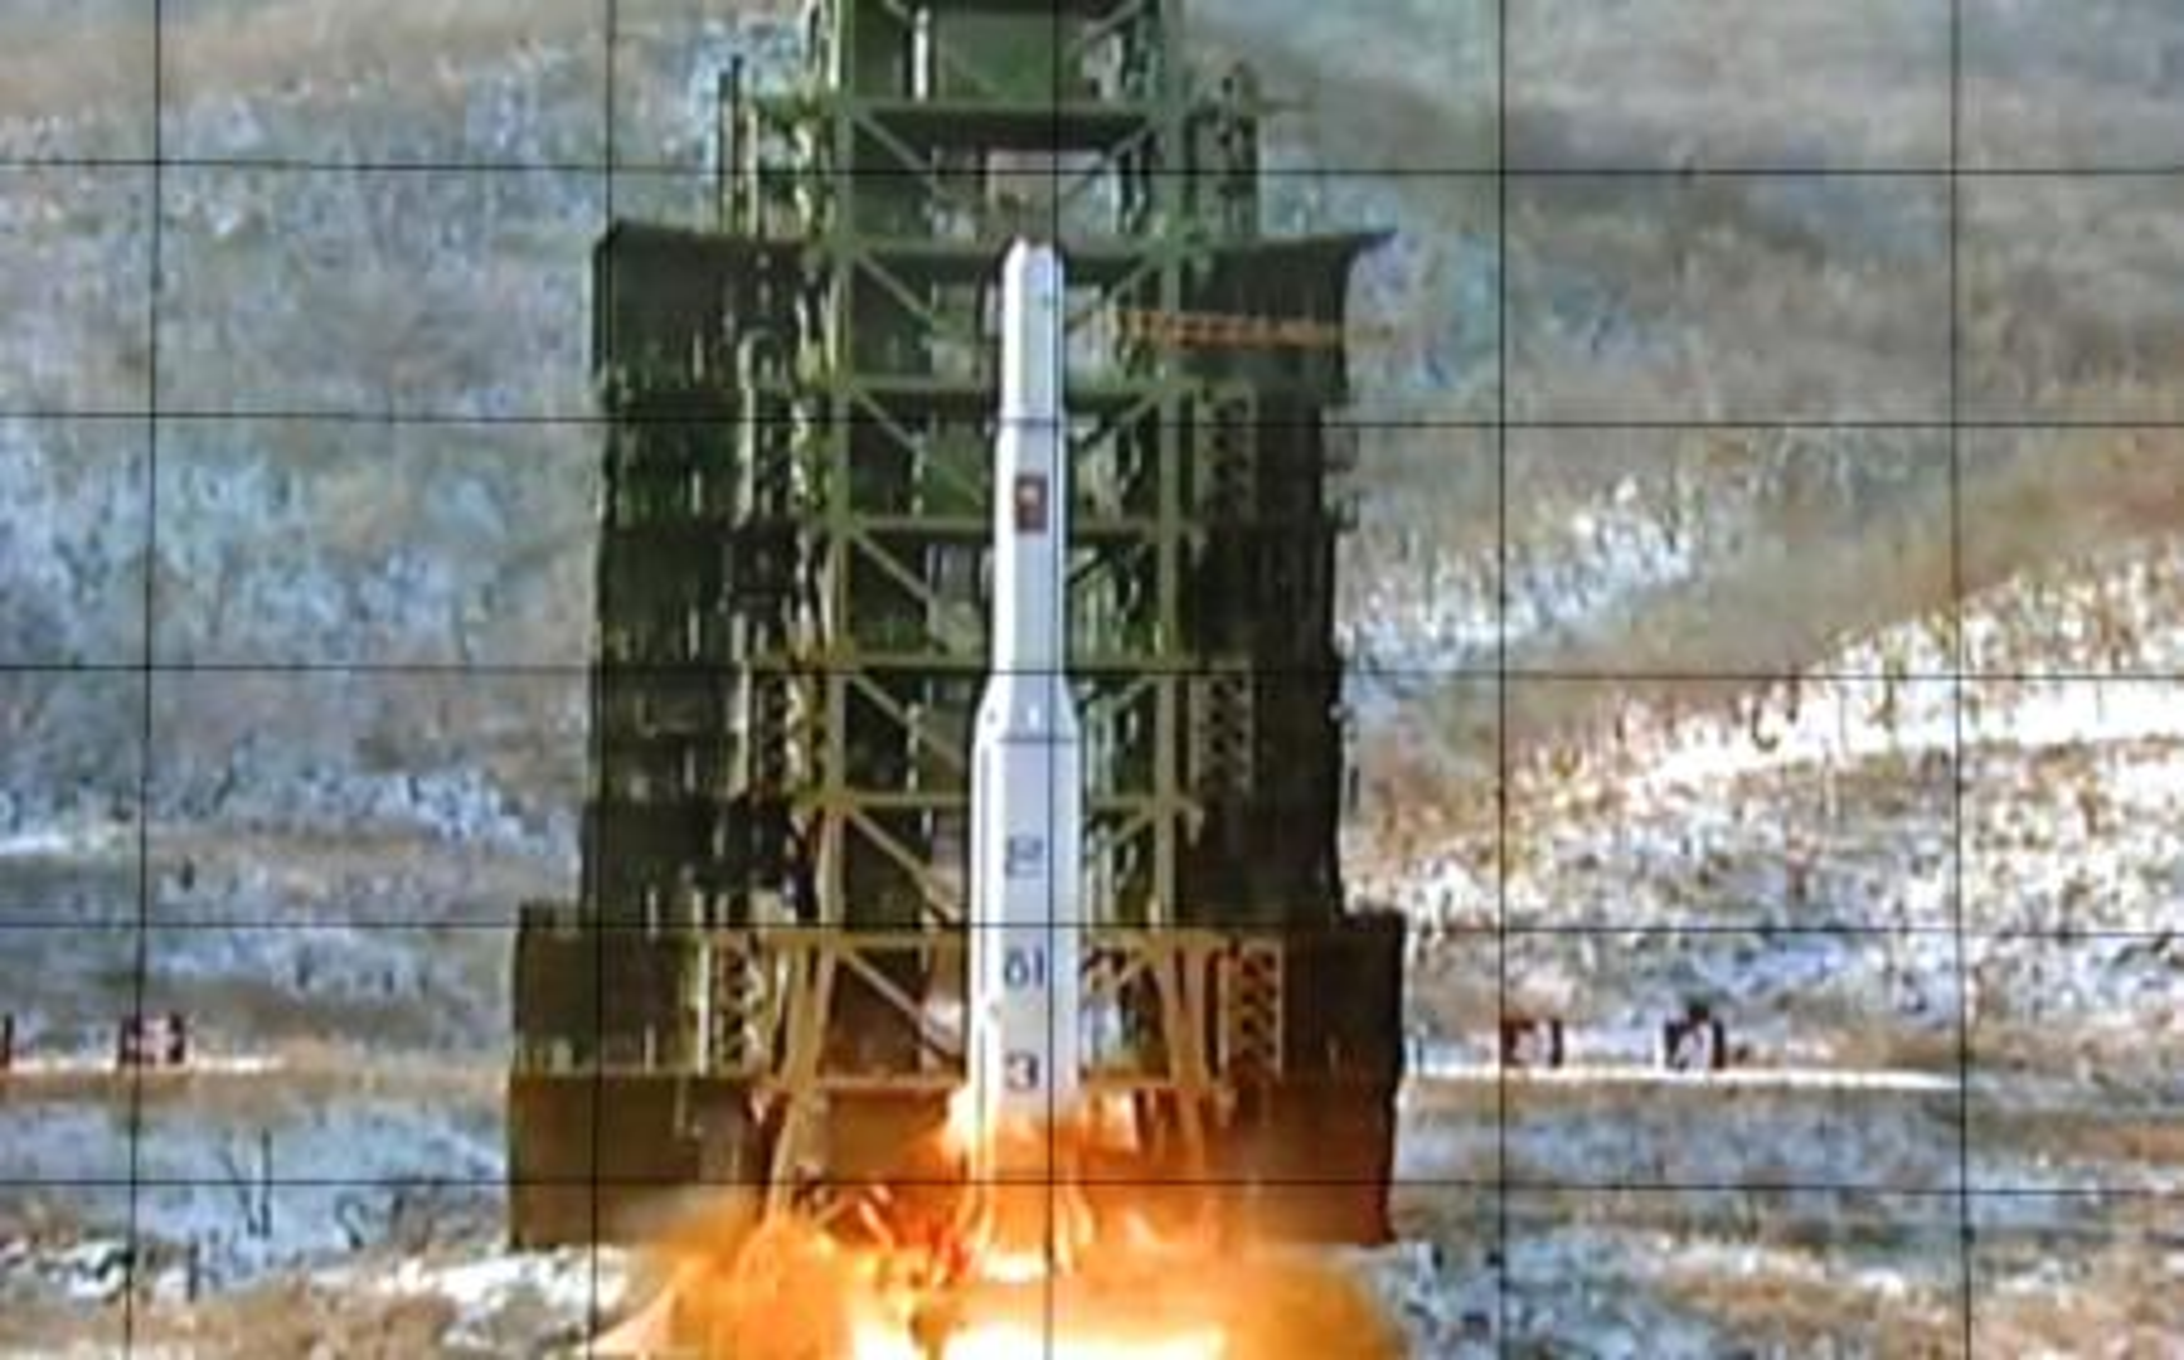 North Korean missile, satellite